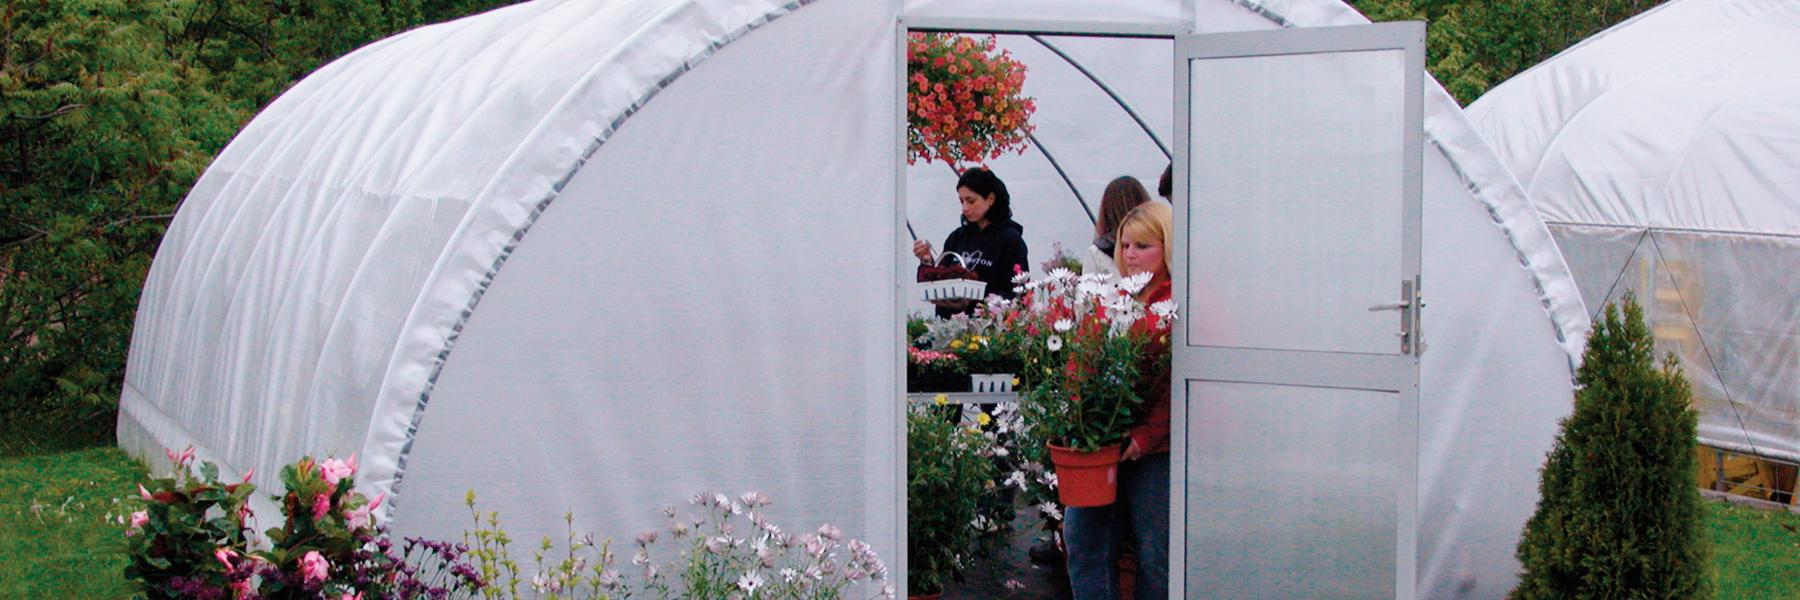 Round Pro greenhouse